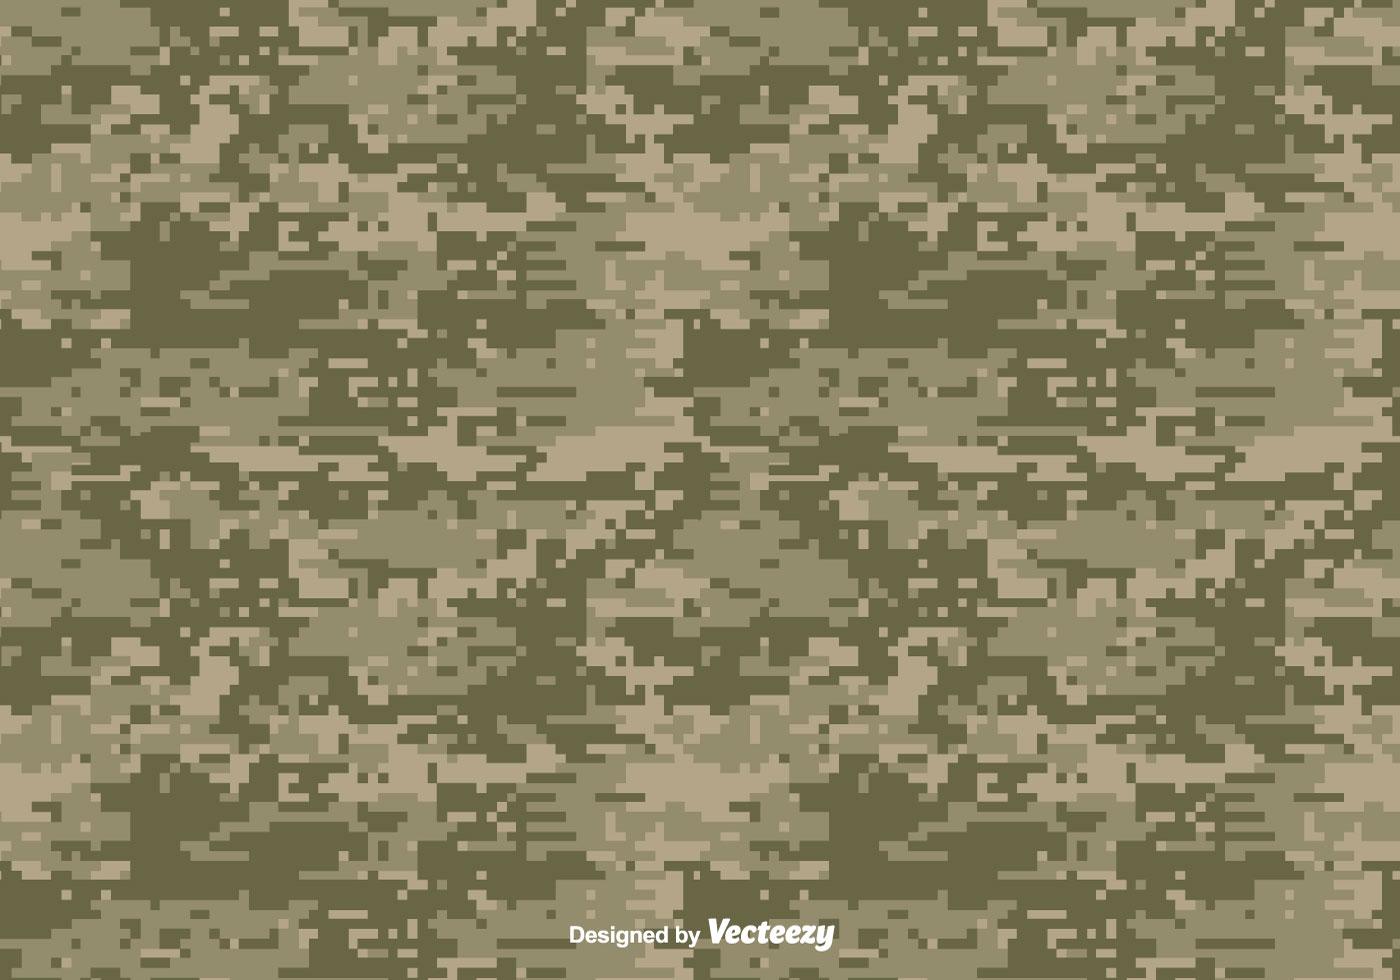 Vector Multicam Camouflage Texture Download Free Vector